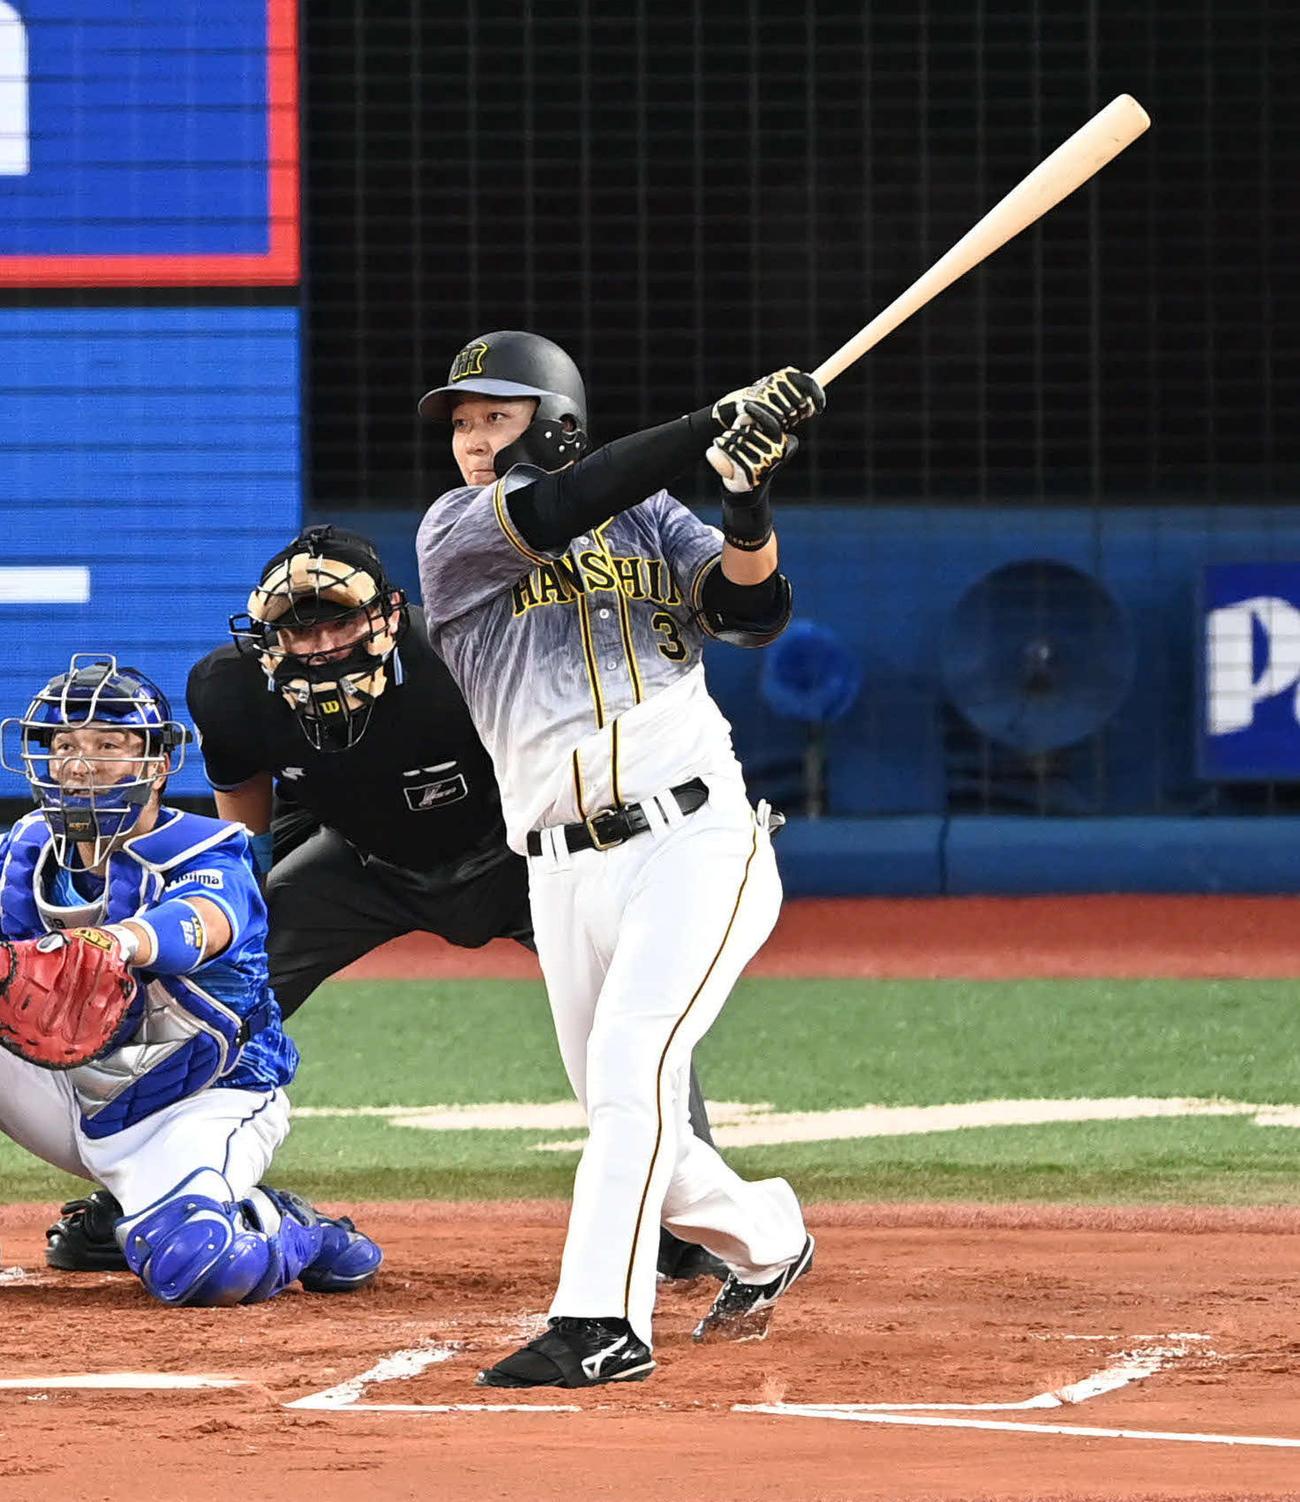 DeNA対阪神 3回表阪神2死一塁、大山は中越え2点本塁打を放つ(撮影・滝沢徹郎)